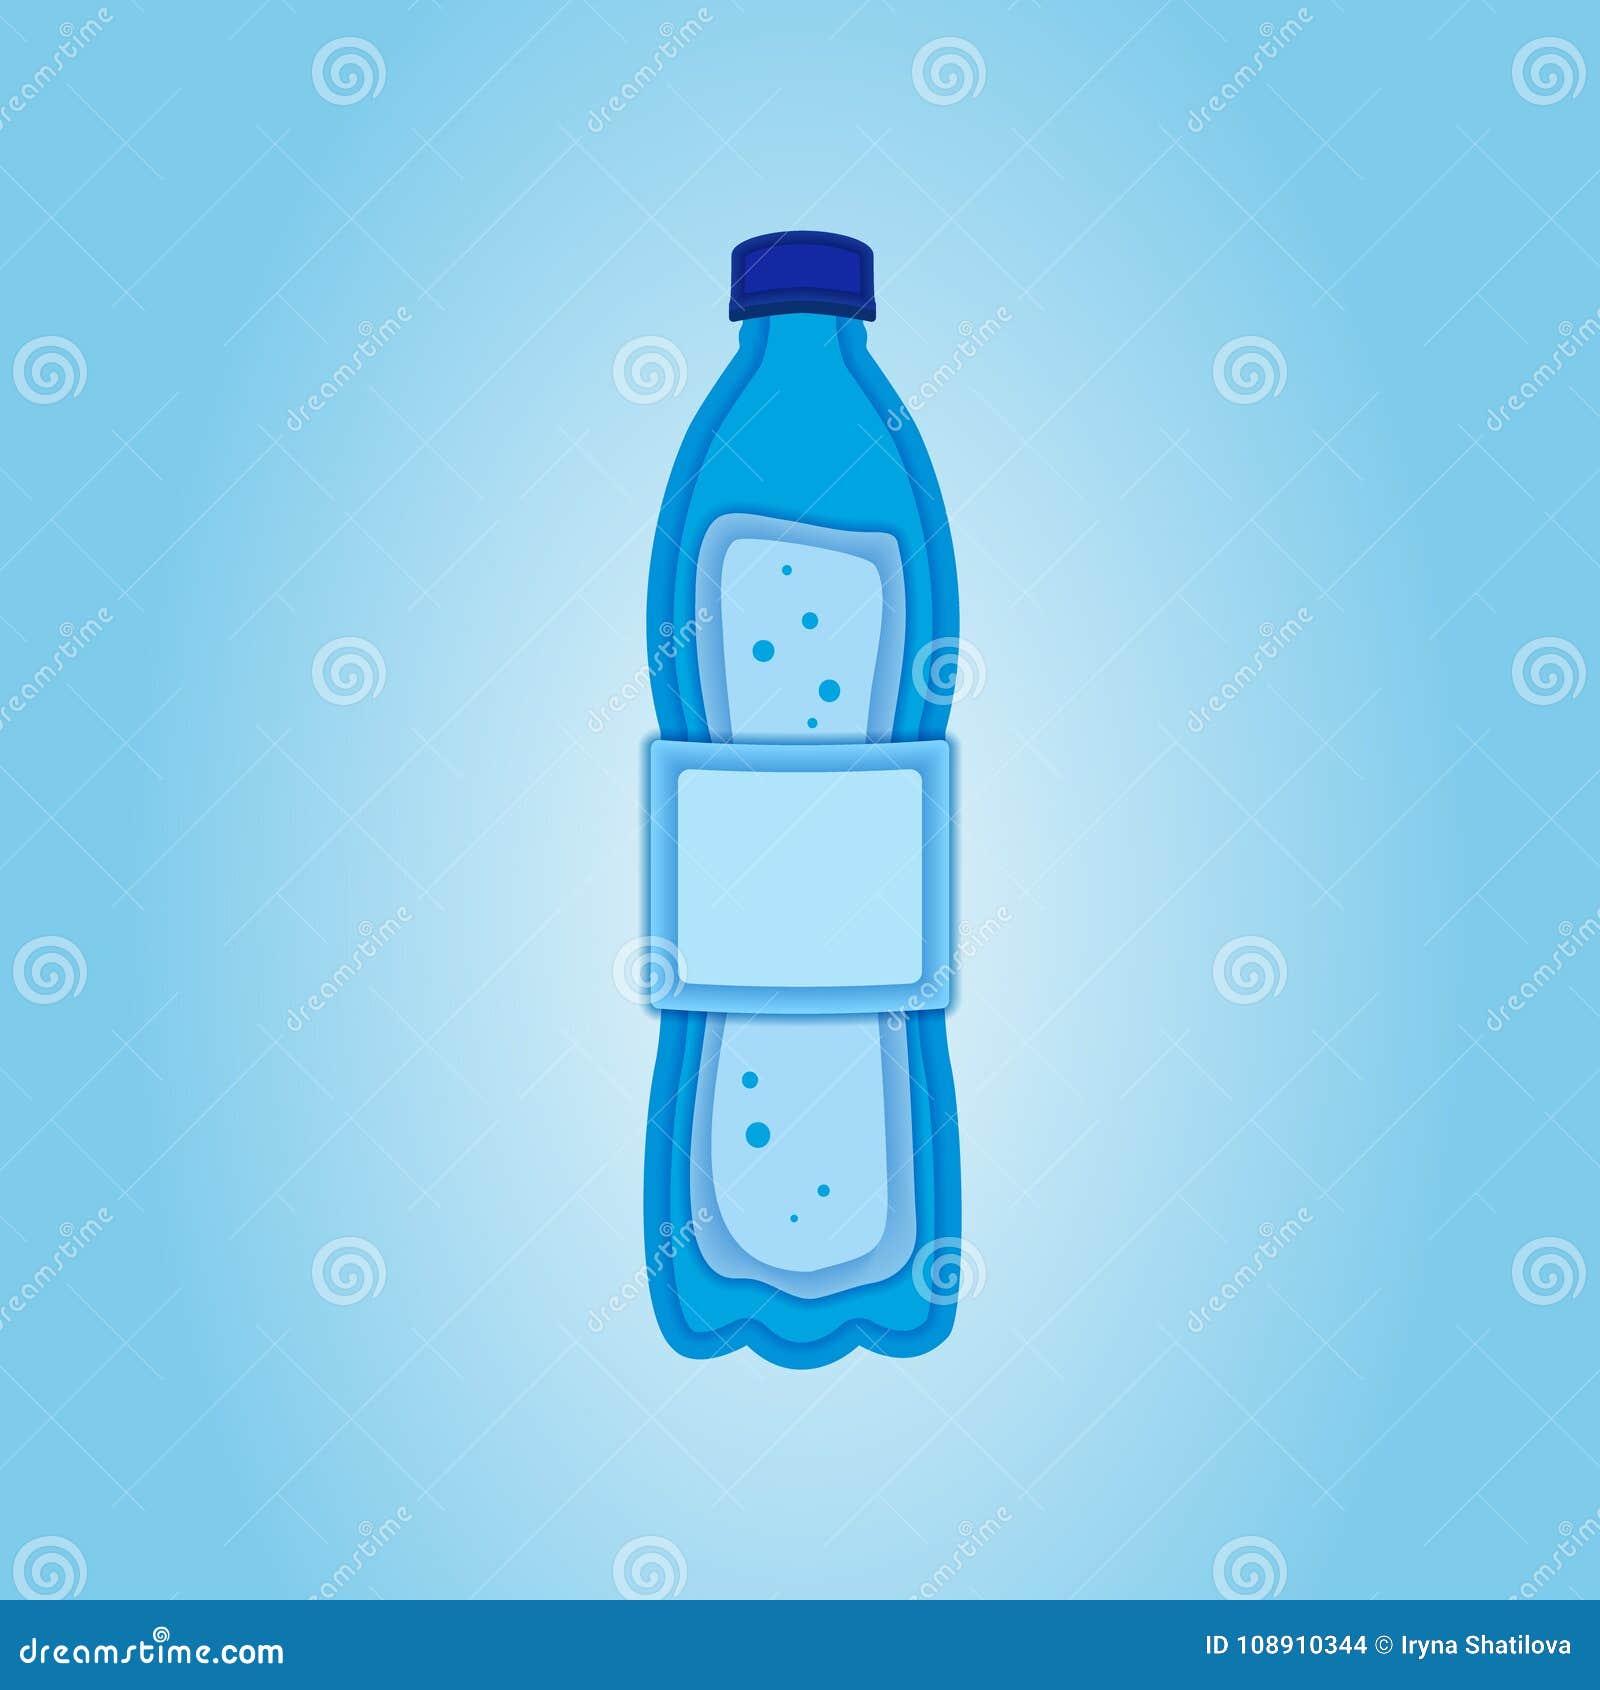 Paper Art Carve Of Water Bottle Logo Design Template Save Ecology Concept